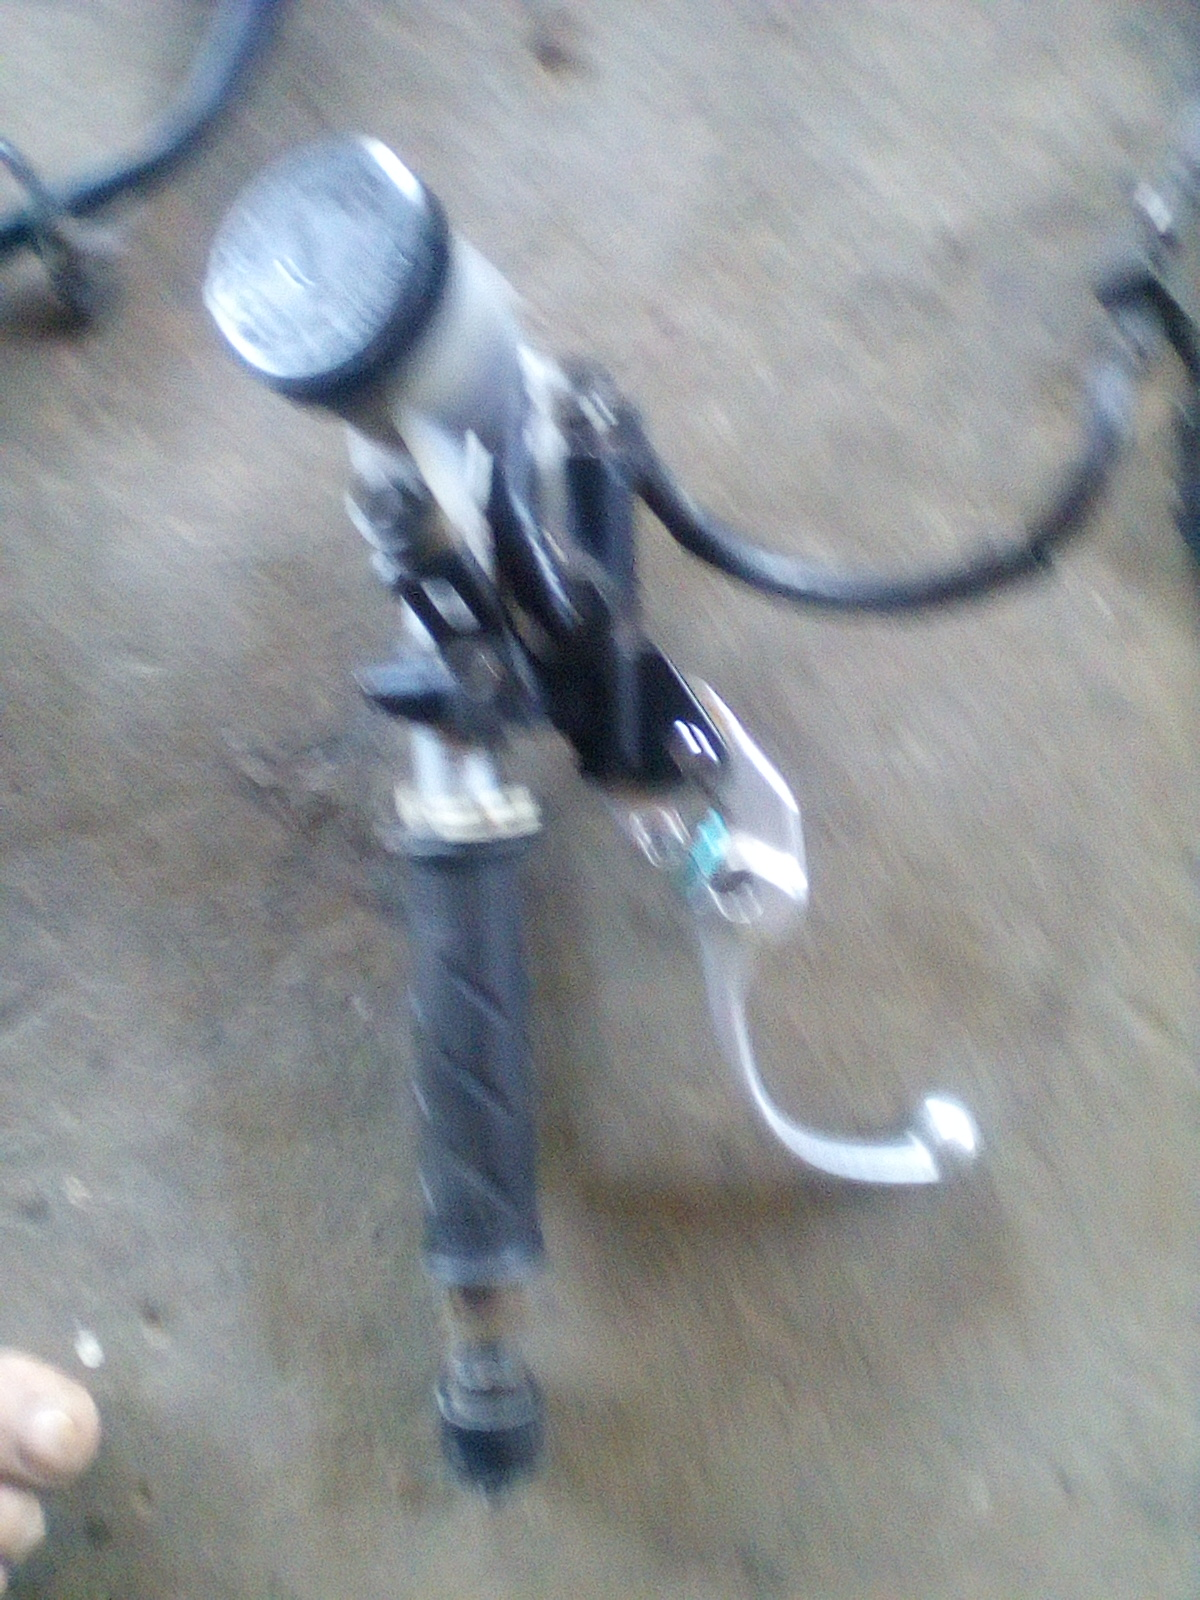 honda vtr  fire storm parts fore sale -98